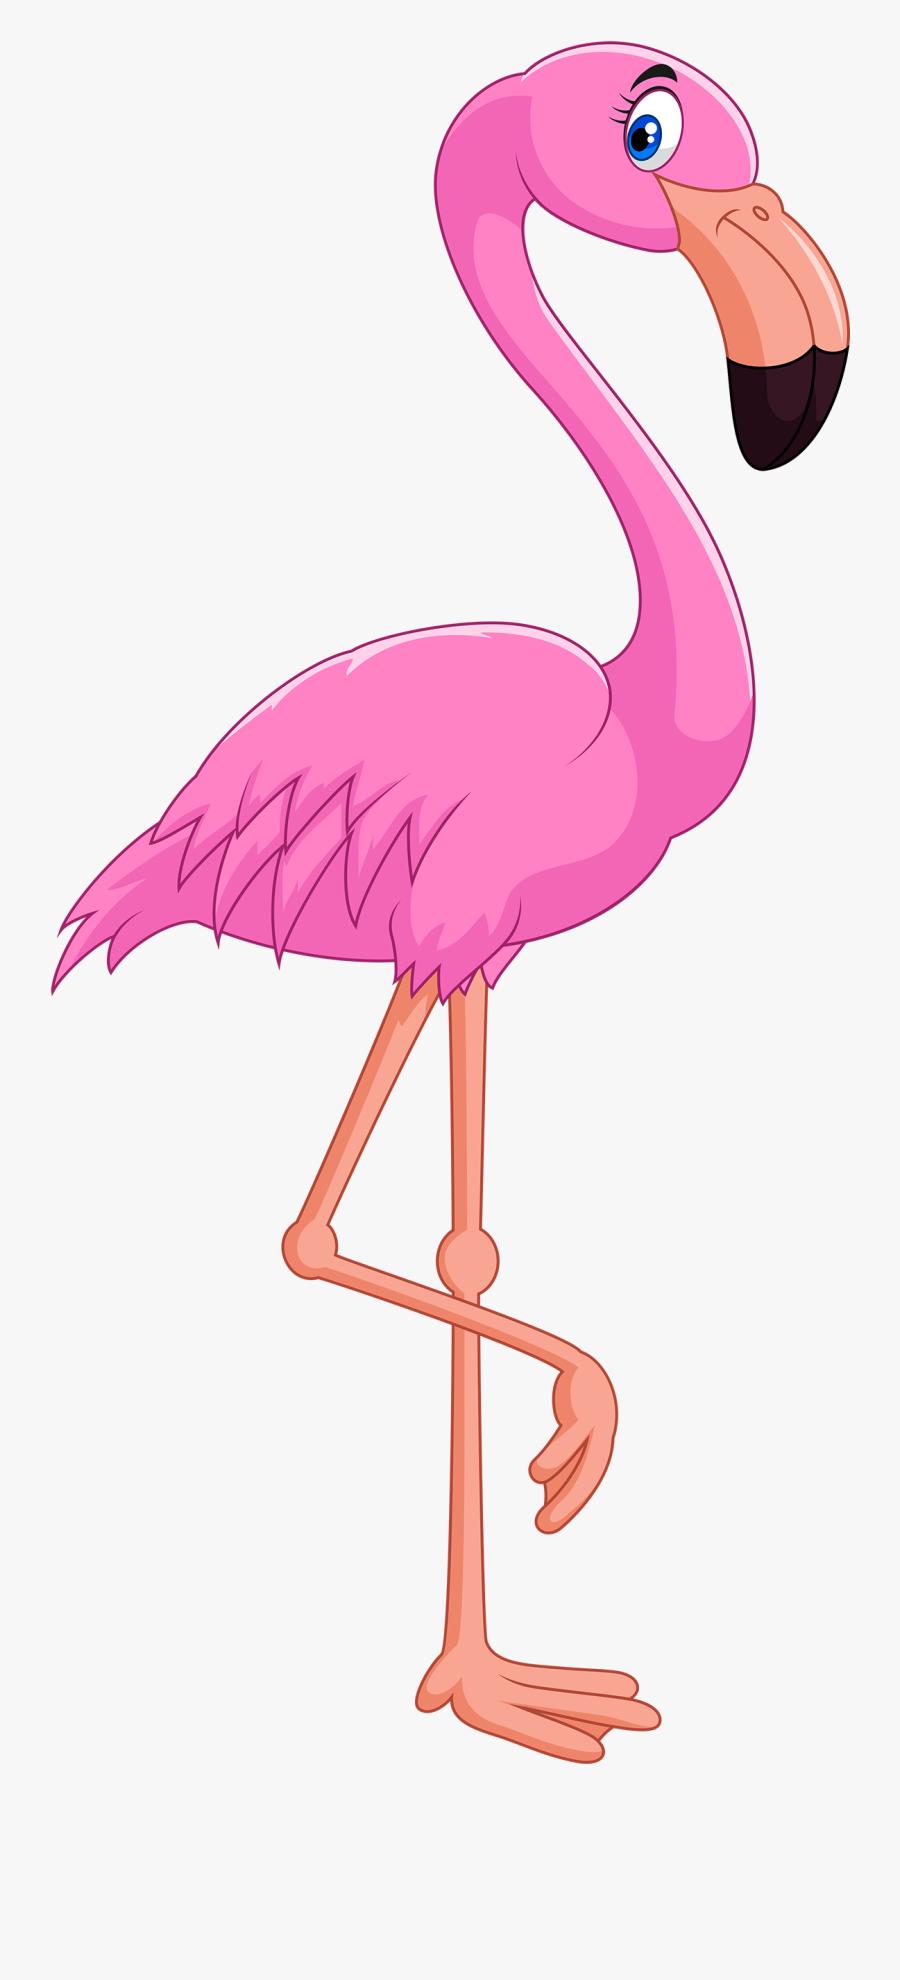 Flamingo Clipart - Flamingo Friday , Free Transparent ... - photo#9